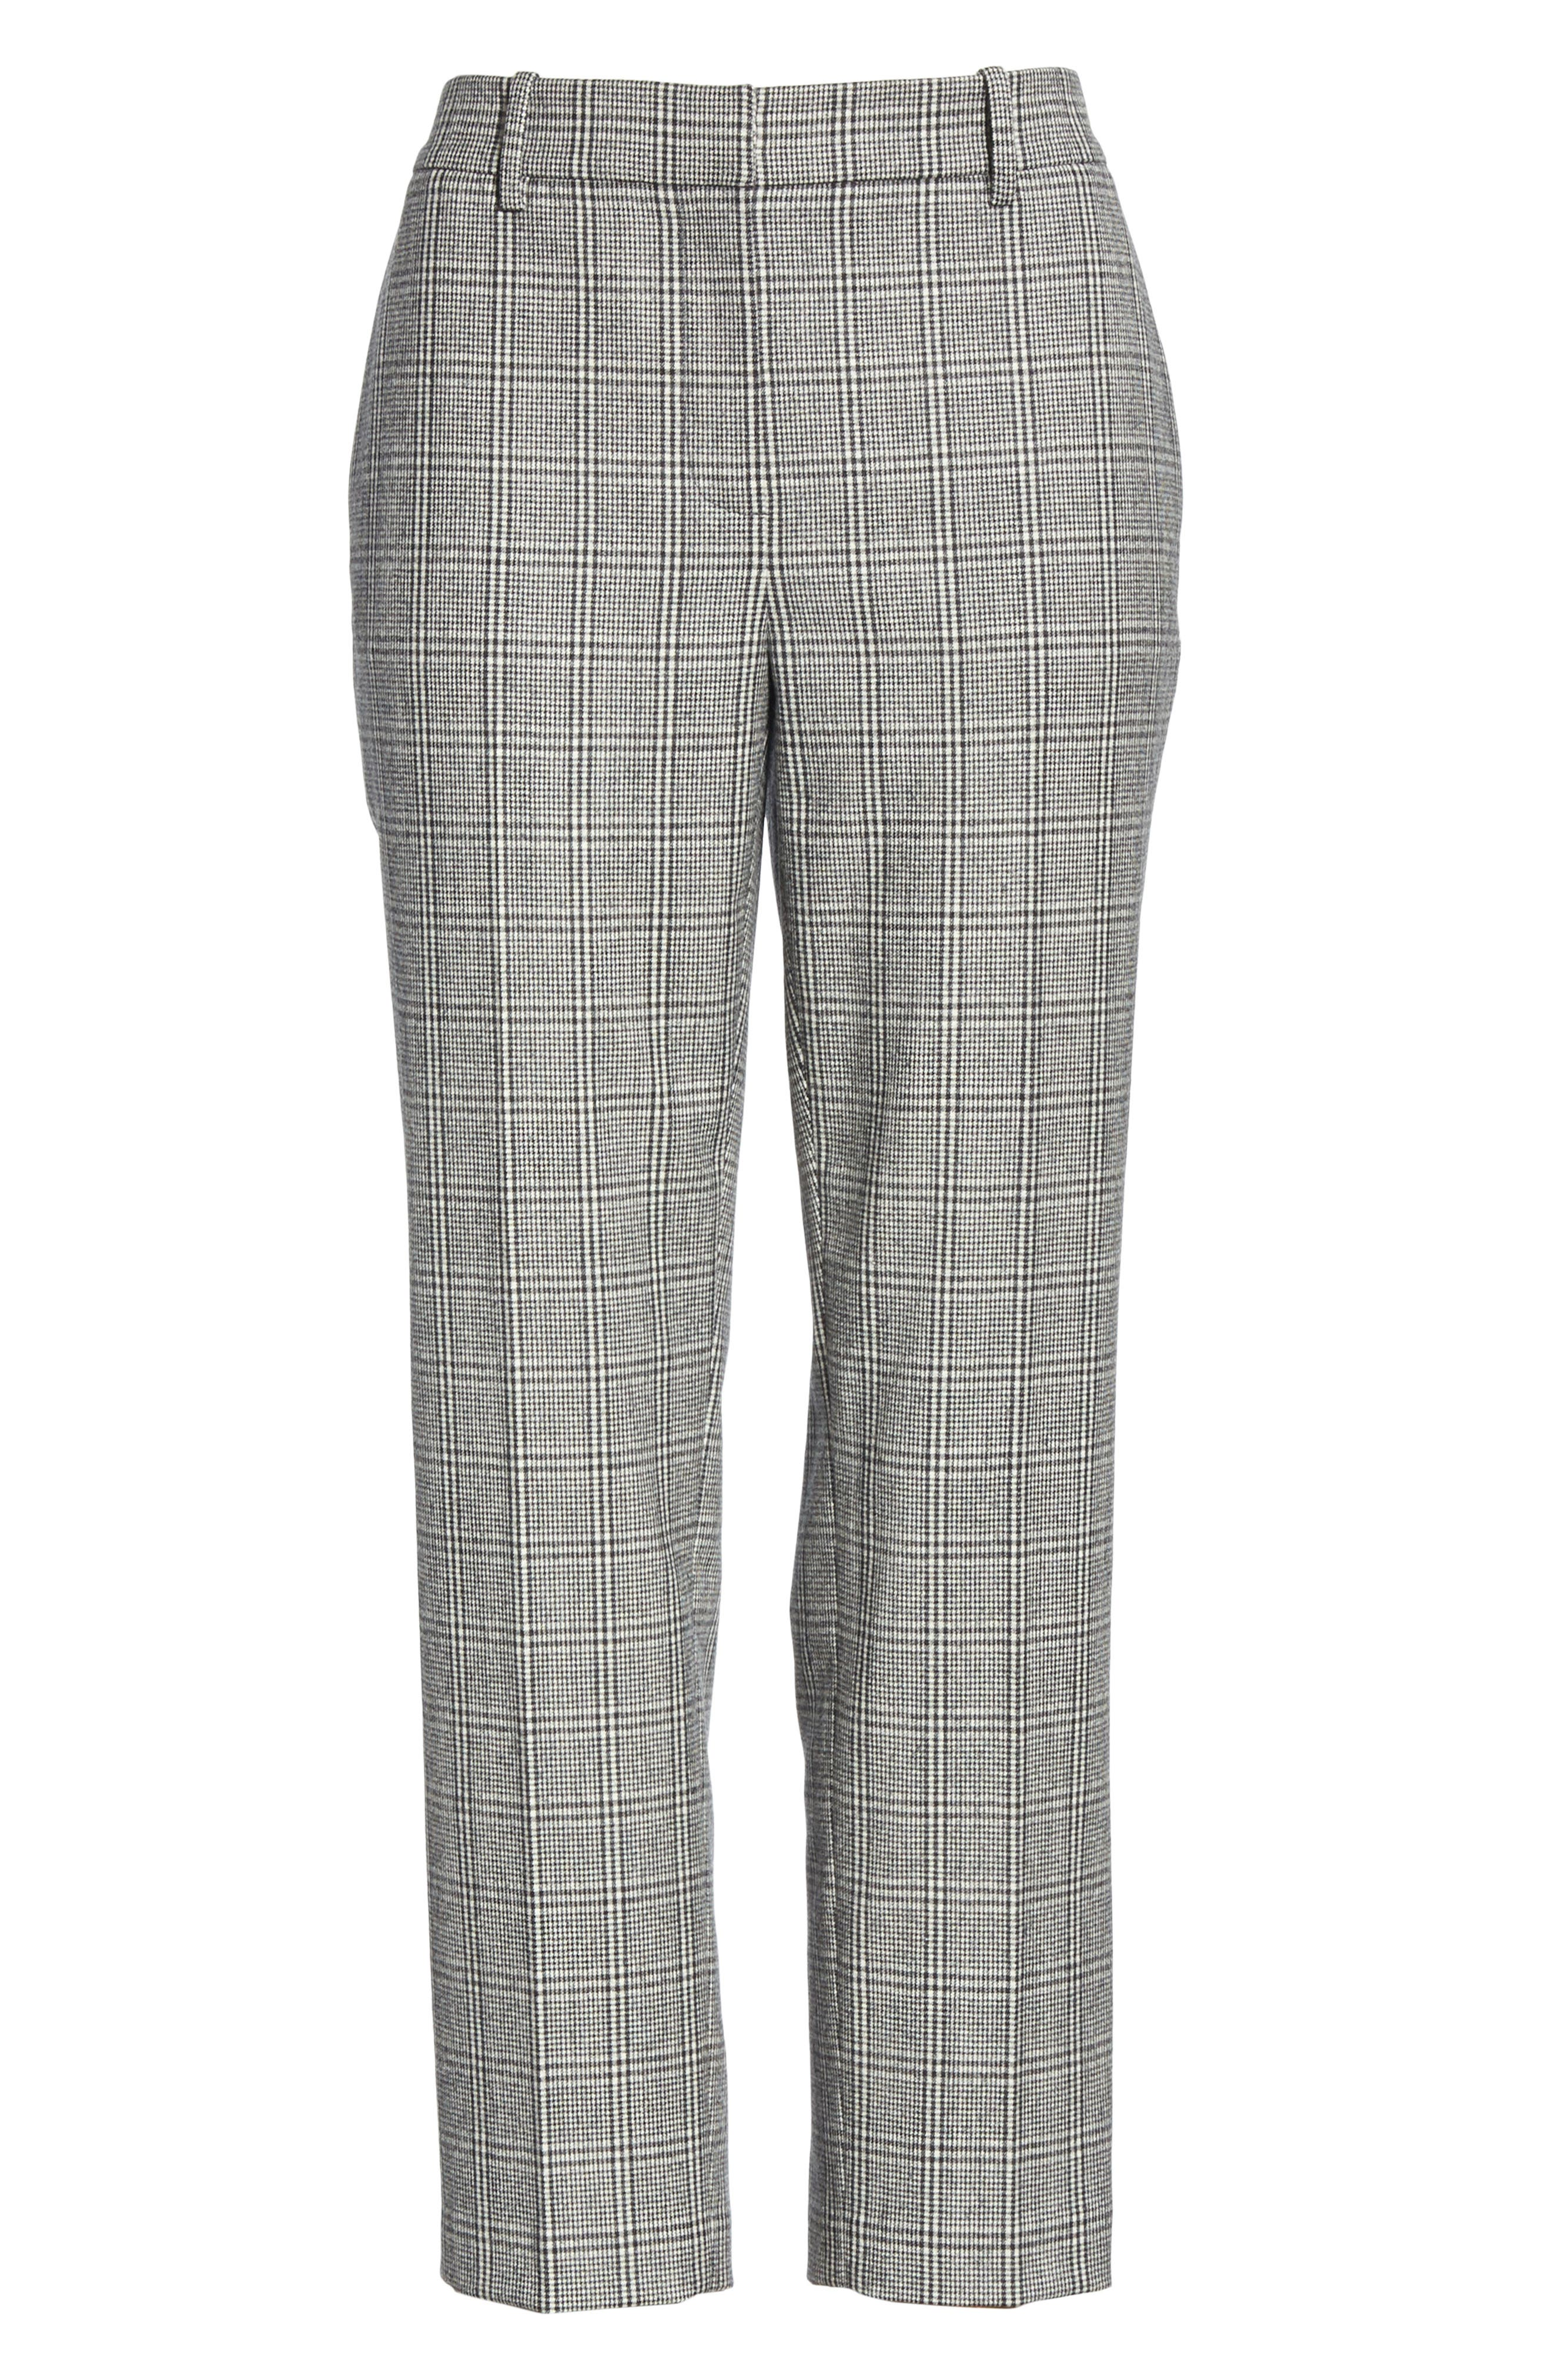 Check Crop Pants,                             Alternate thumbnail 6, color,                             BLACK- WHITE ELODIE CHECK